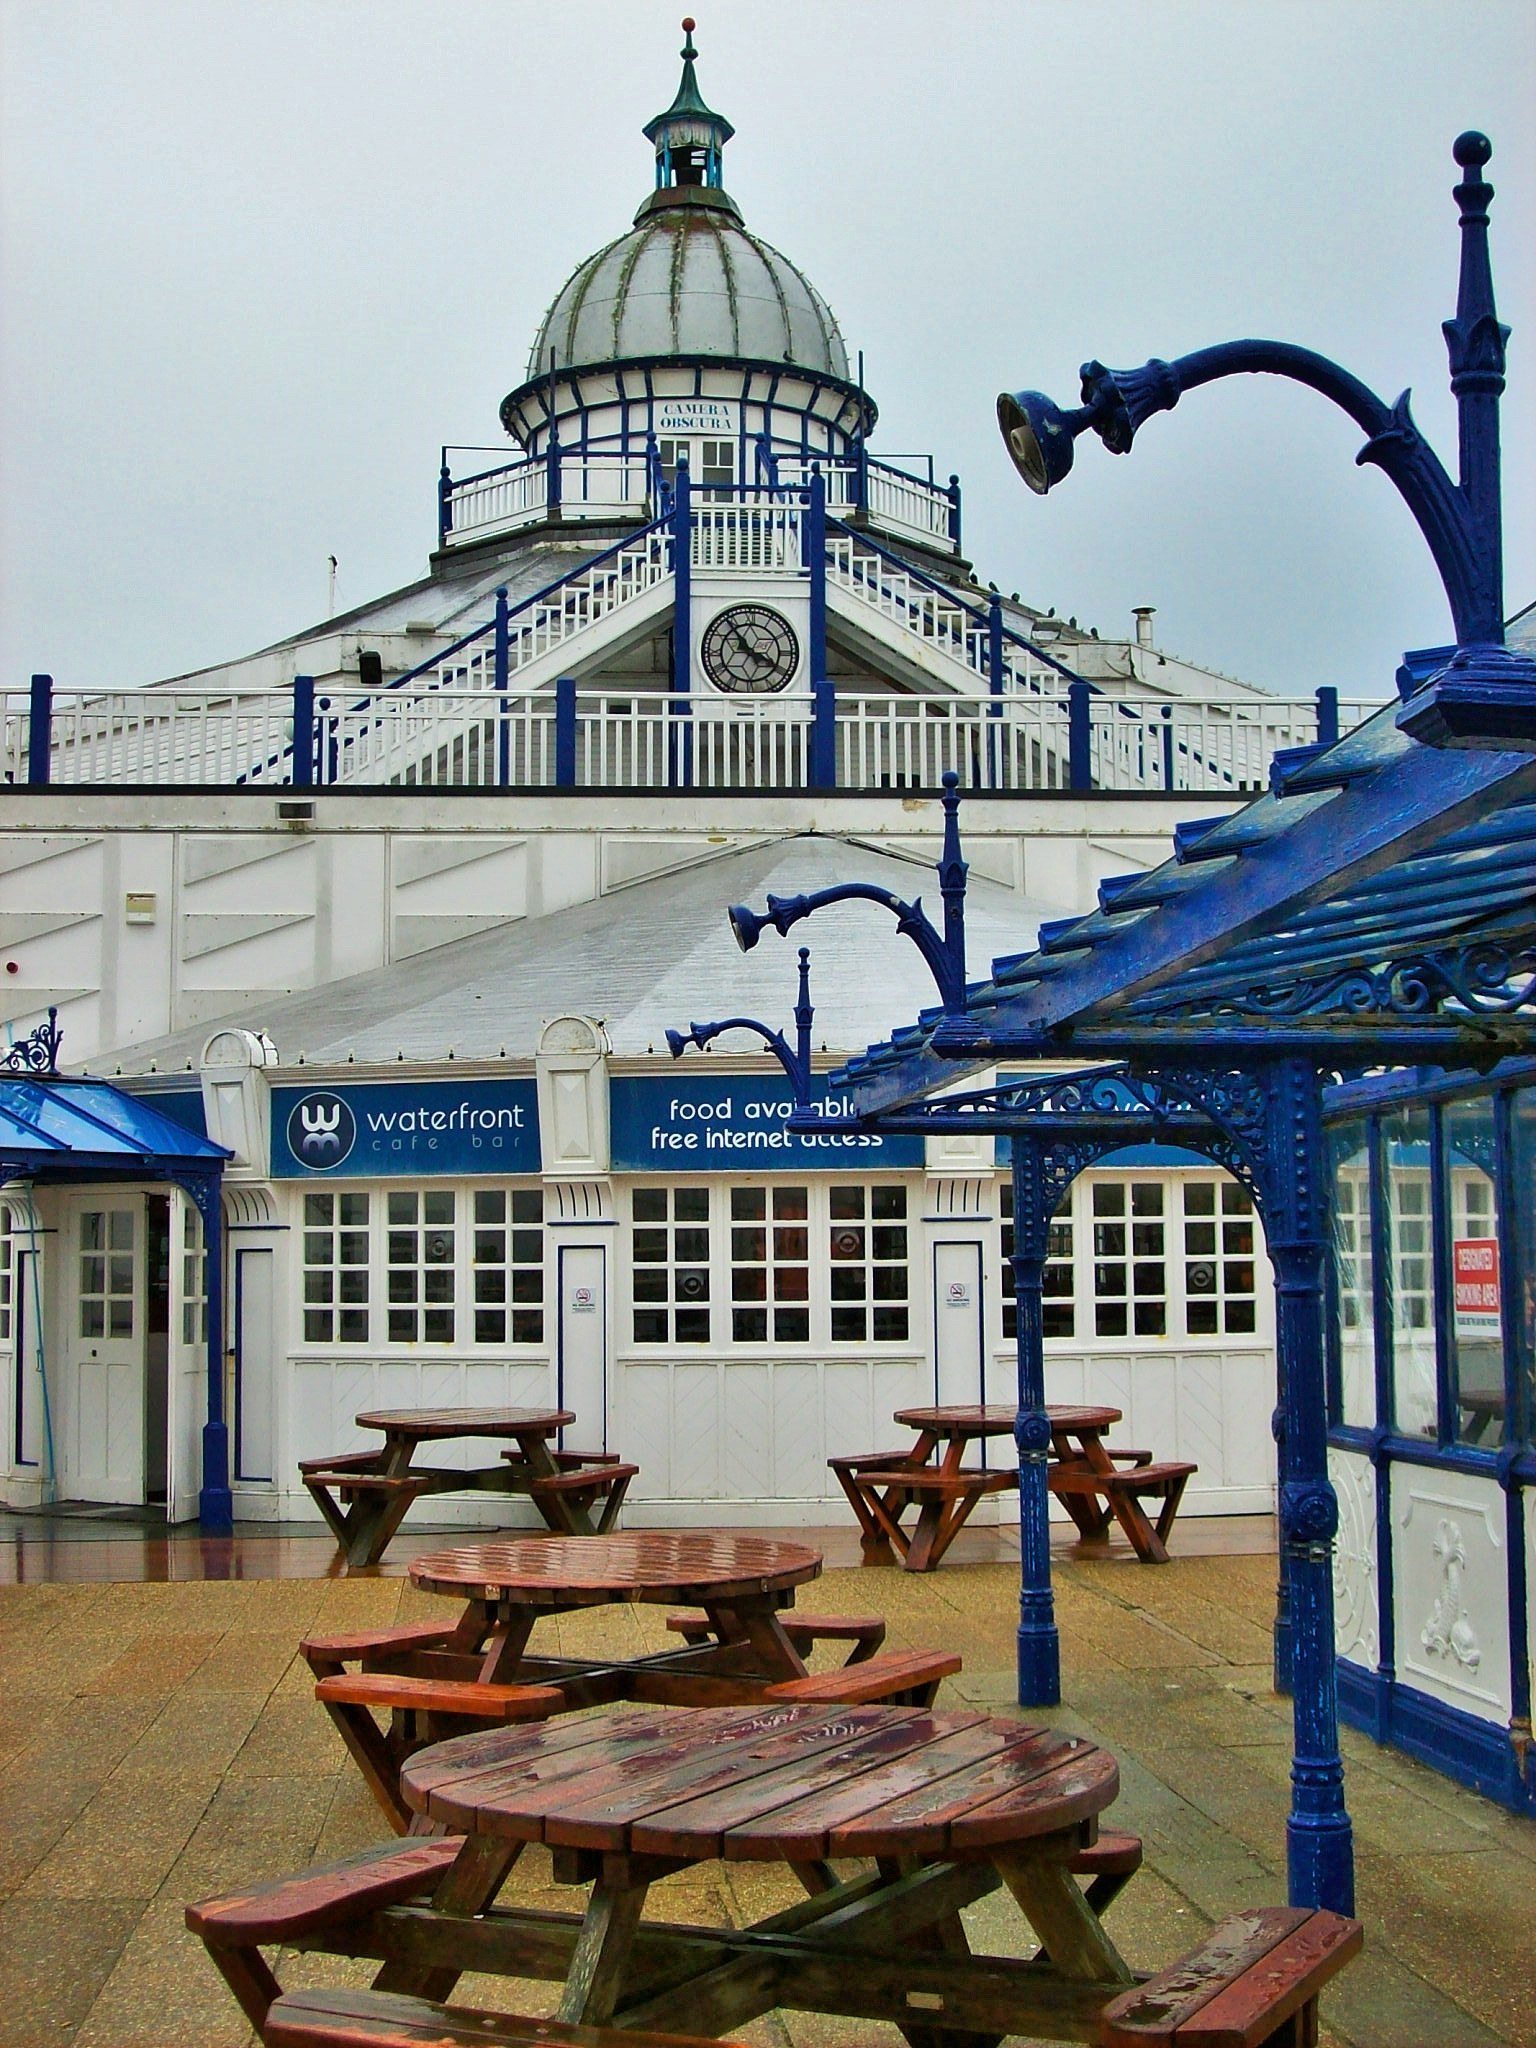 filethe camera obscura eastbourne pierjpg wikimedia